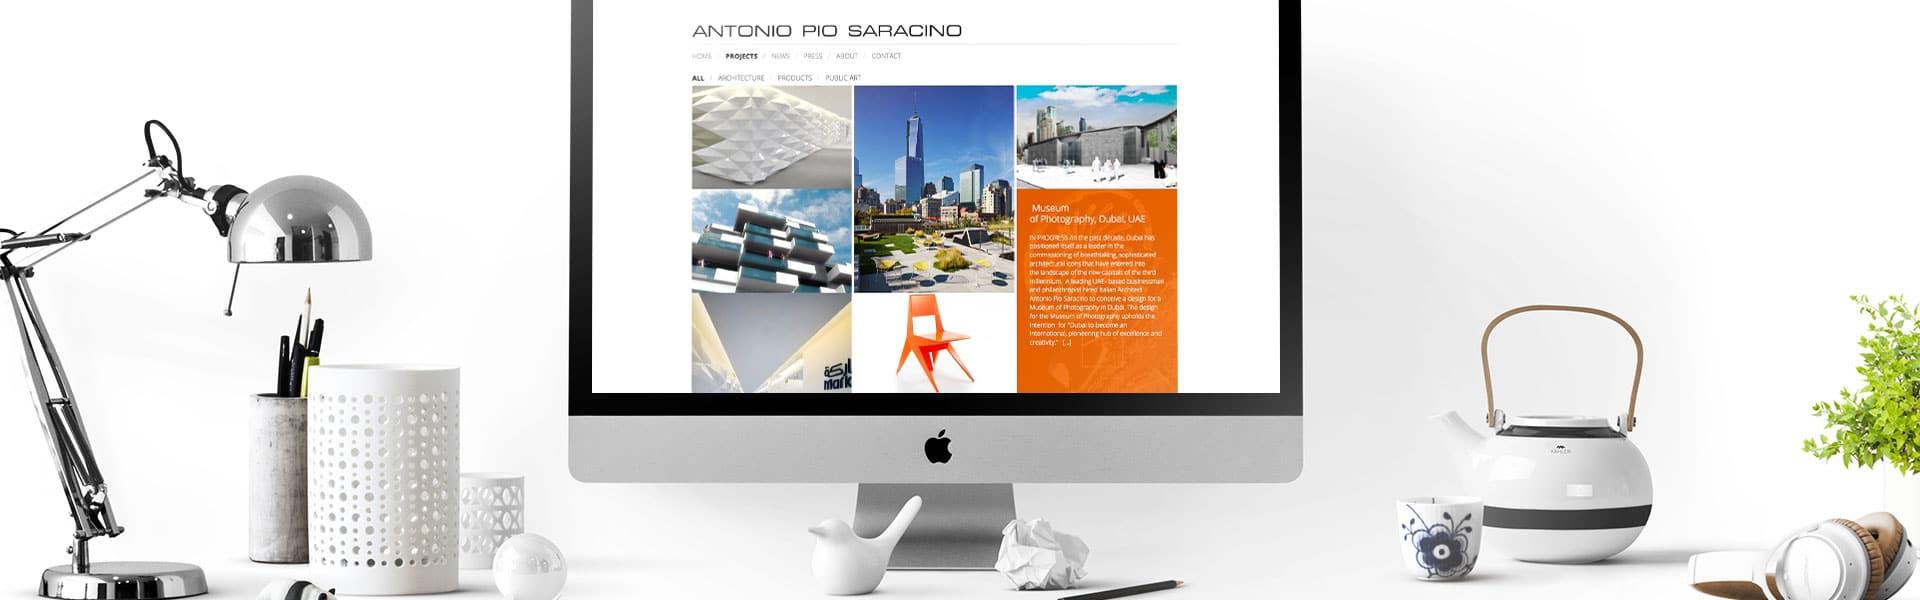 Antonio Pio Saracino - Sito Online 1